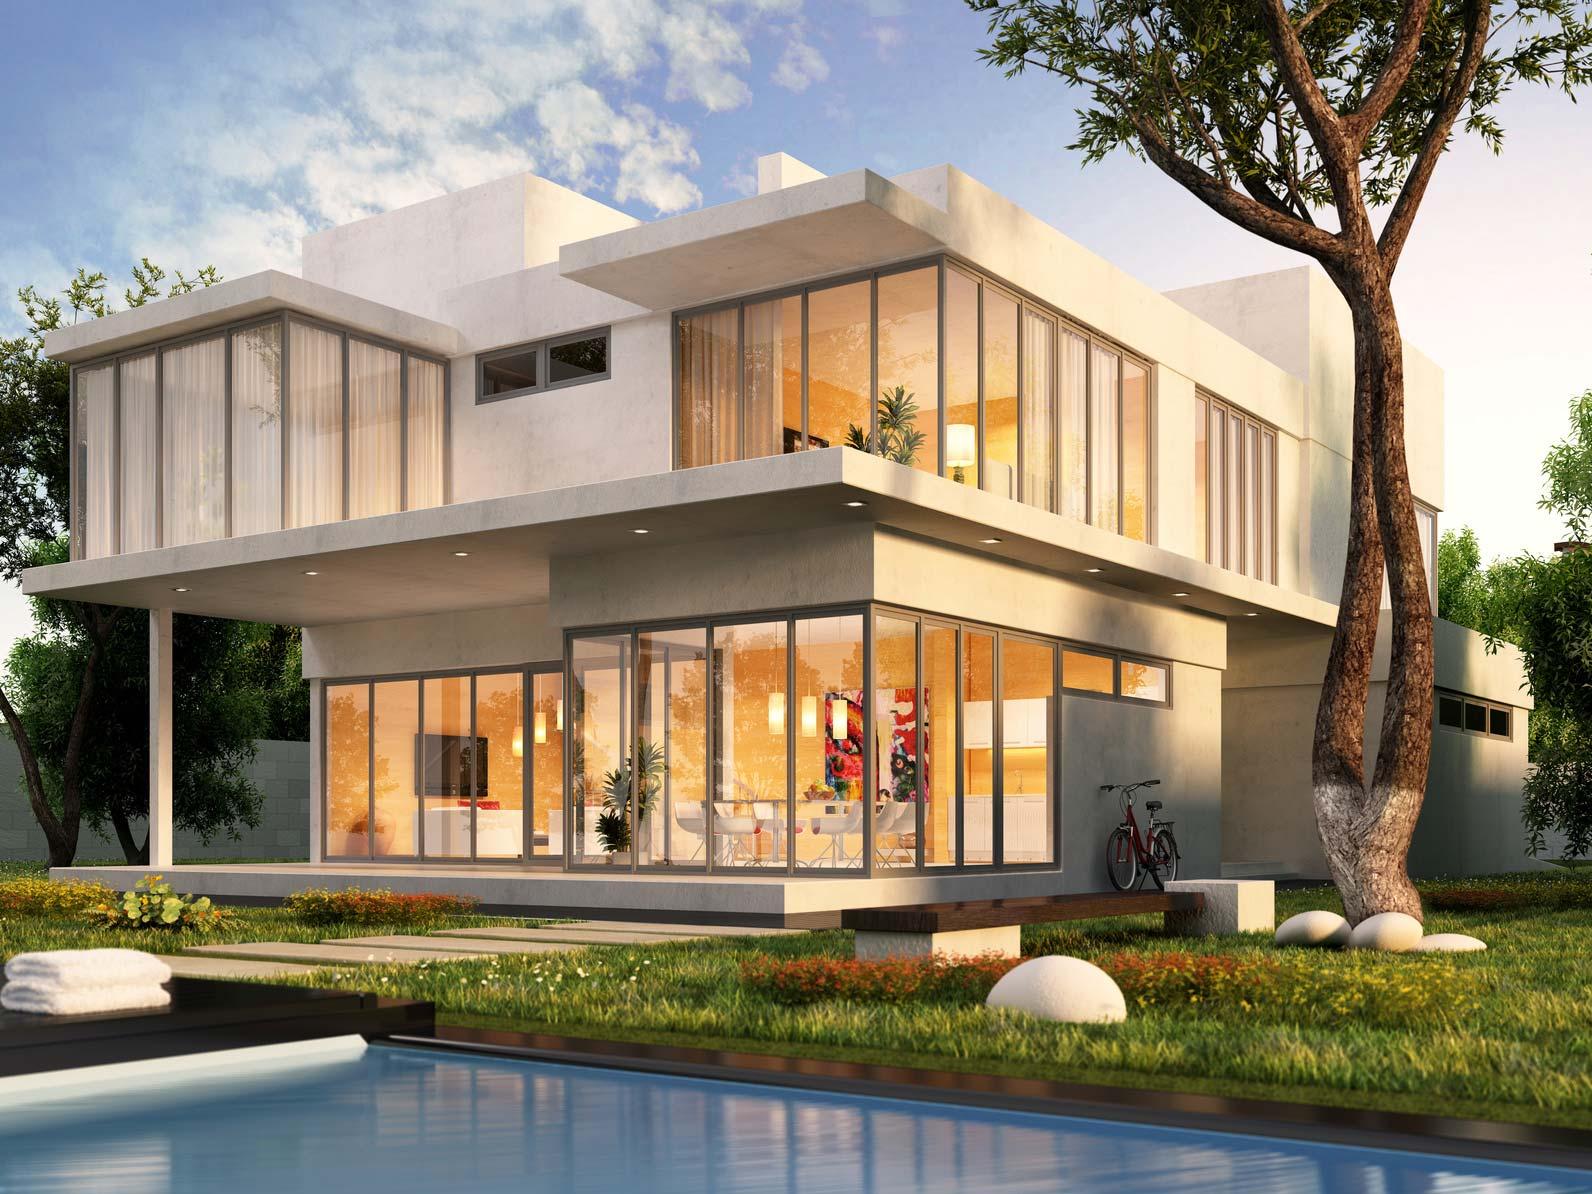 The dream house 28